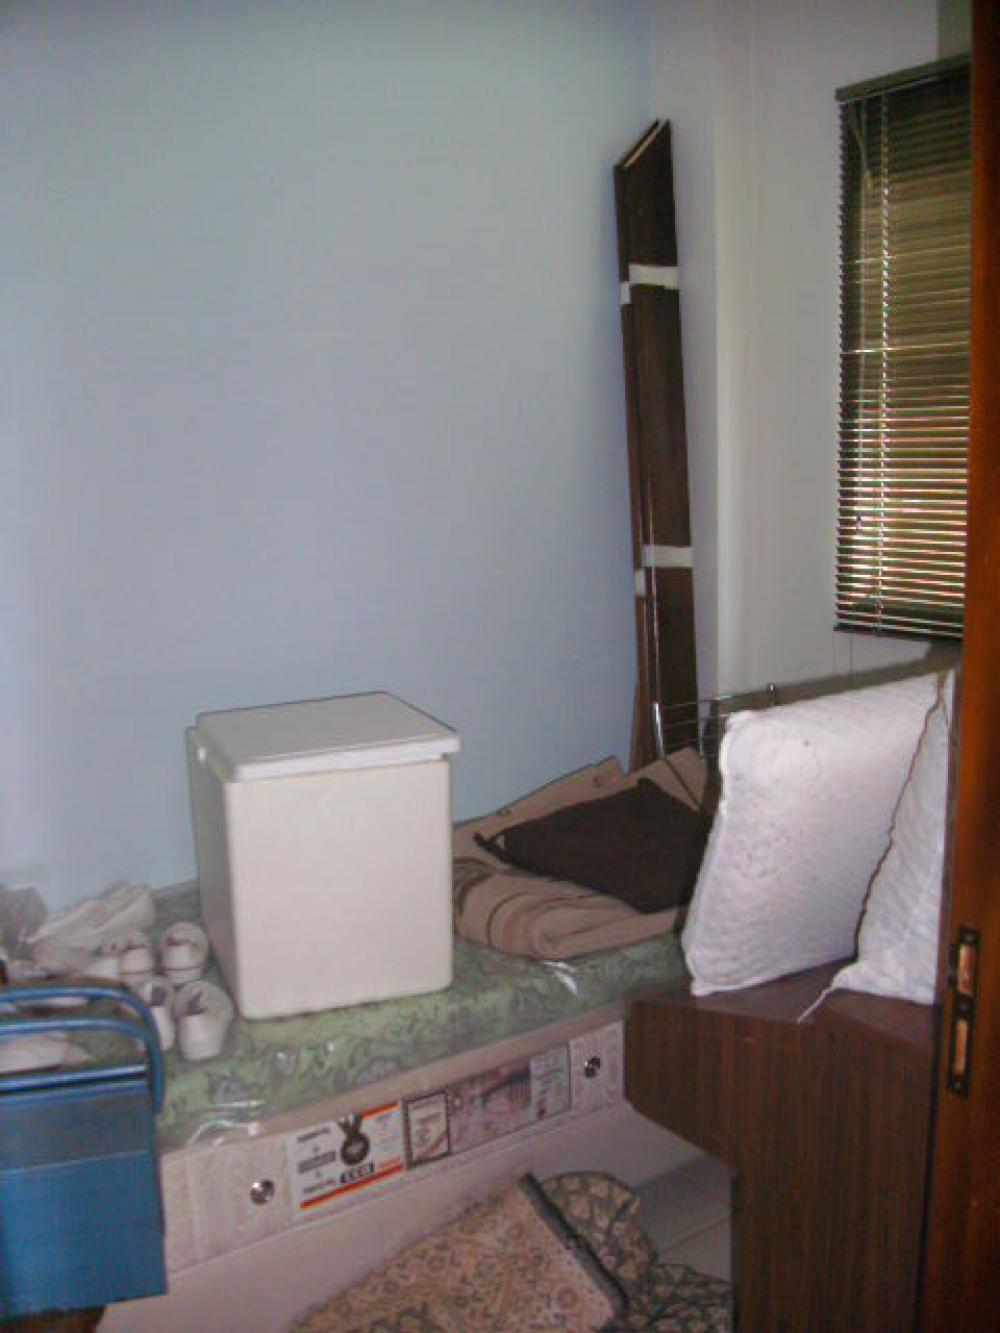 Comprar Casa / Condomínio em Mirassol R$ 750.000,00 - Foto 35